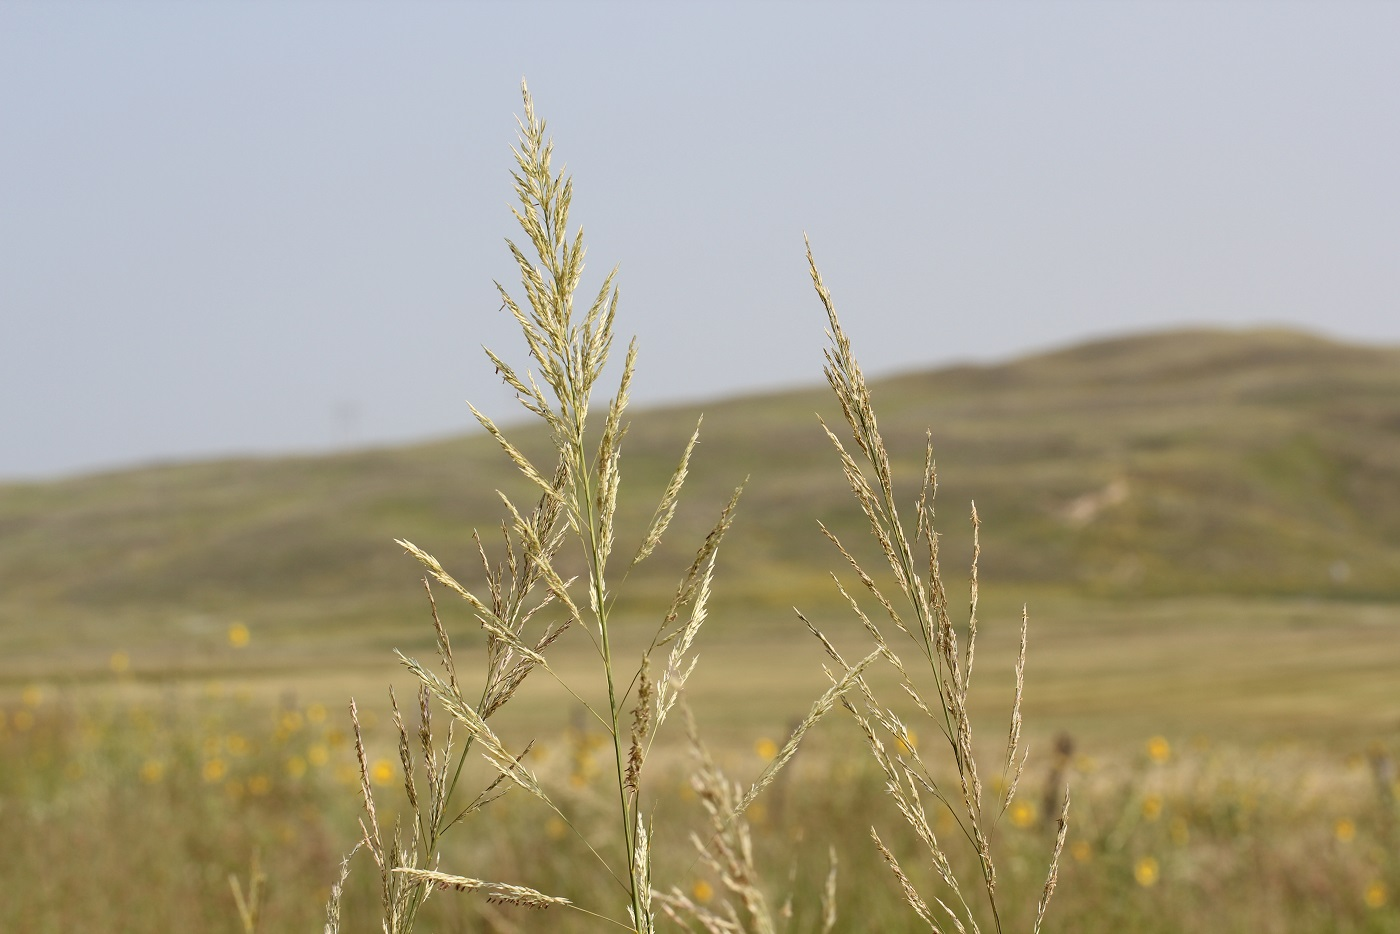 Prairie sandreed